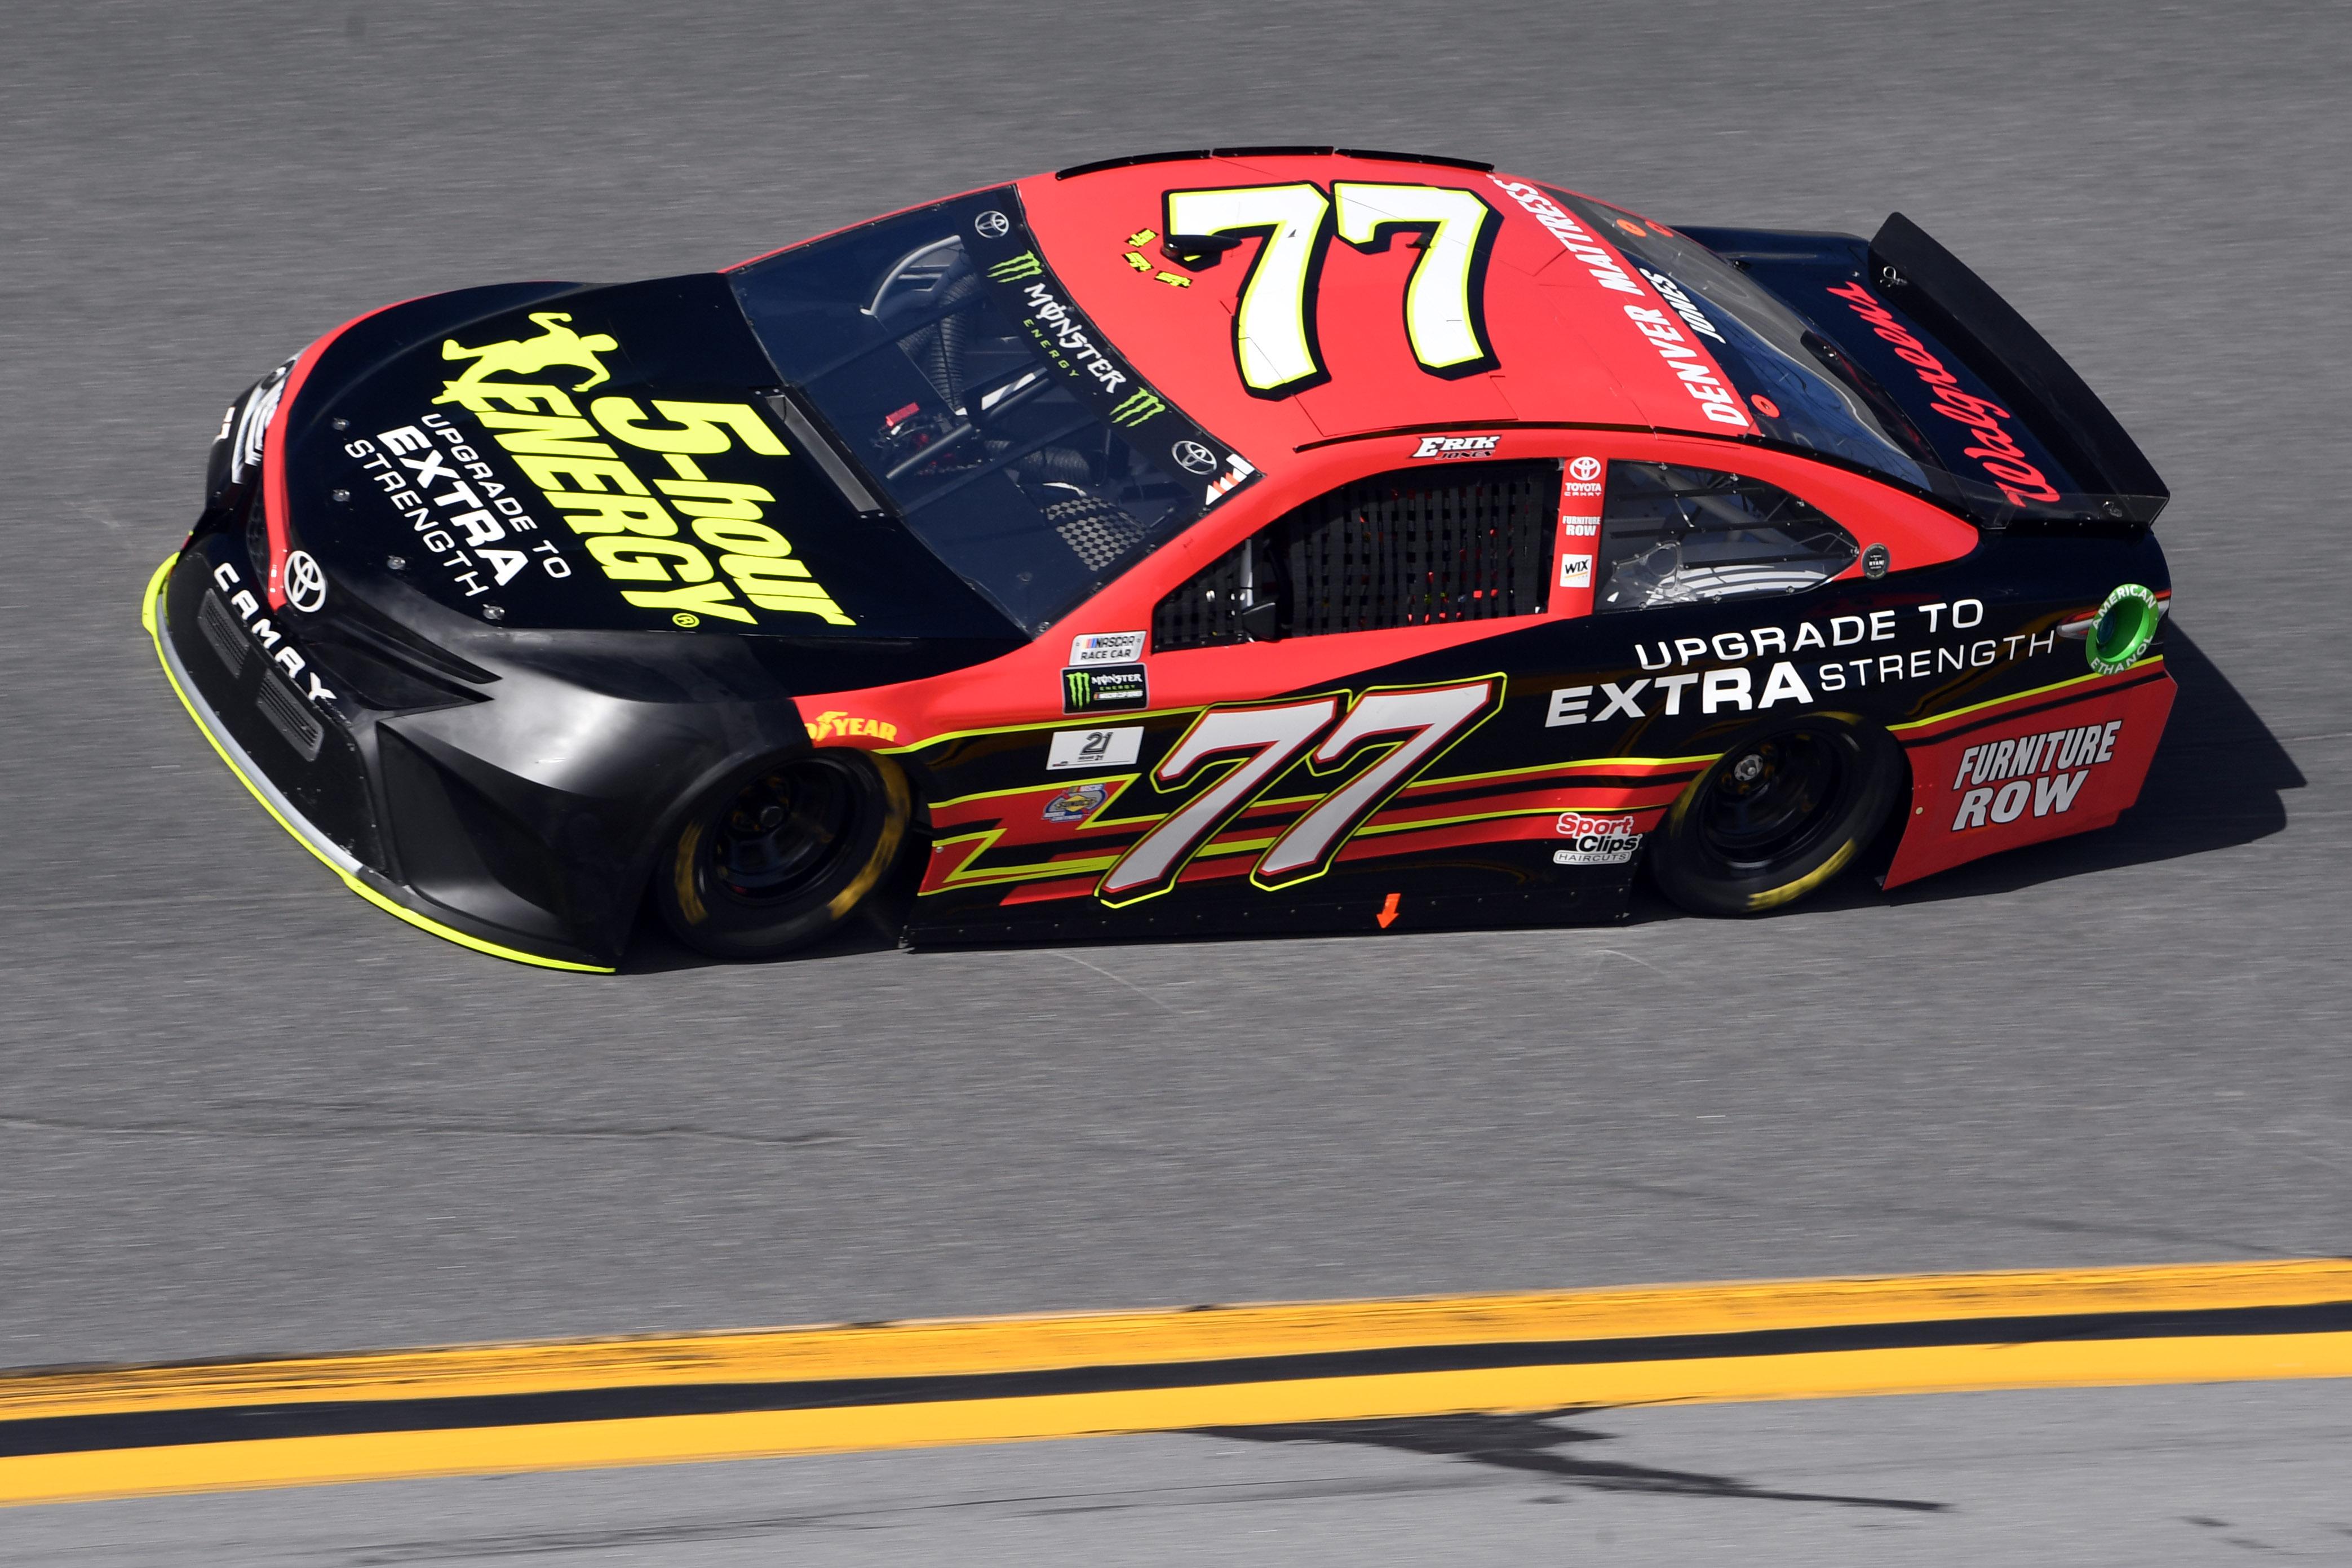 Feb 24, 2017; Daytona Beach, FL, USA; NASCAR Cup Series Driver Erik Jones  (77) During Practice For The Daytona 500 At Daytona International Speedway.